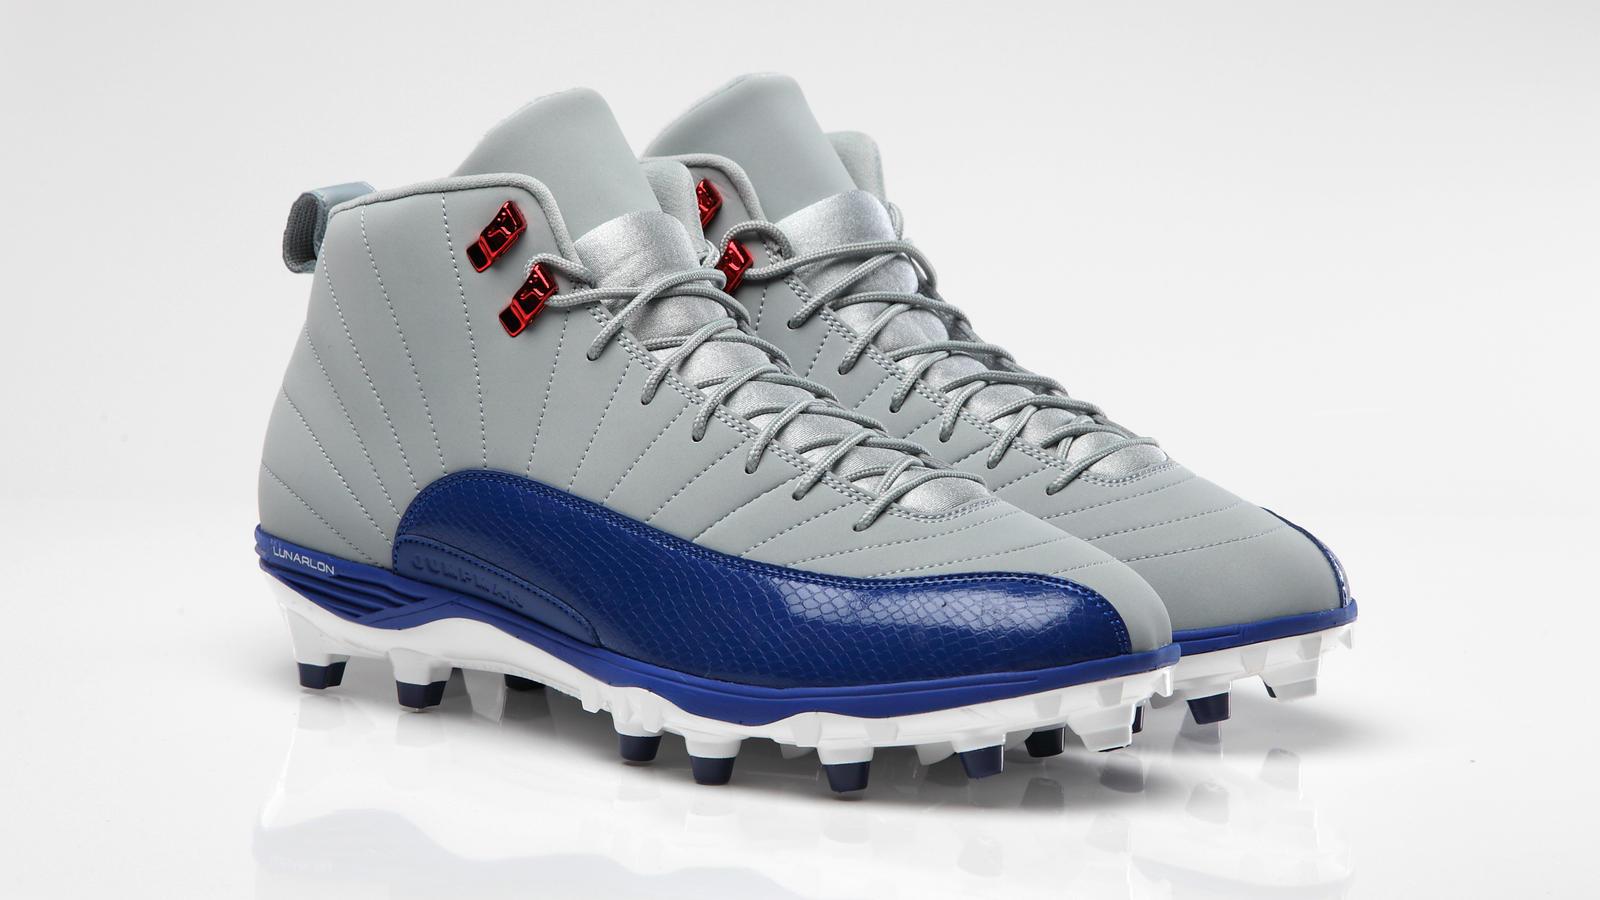 Jordan Brand Football Athletes to Wear